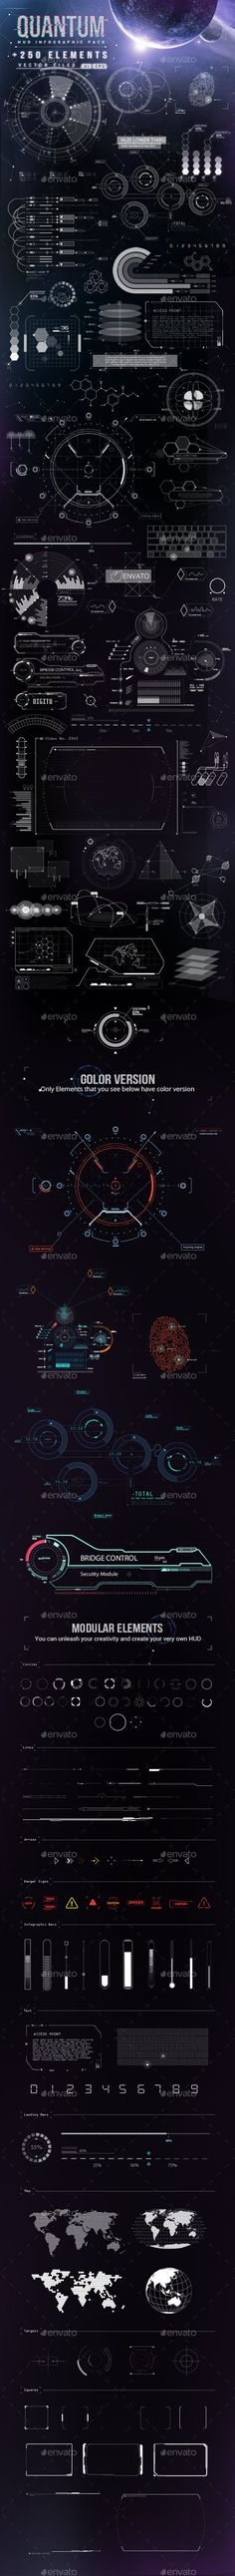 Best 30 Infographics Template Designs 2015 - HowFreelance